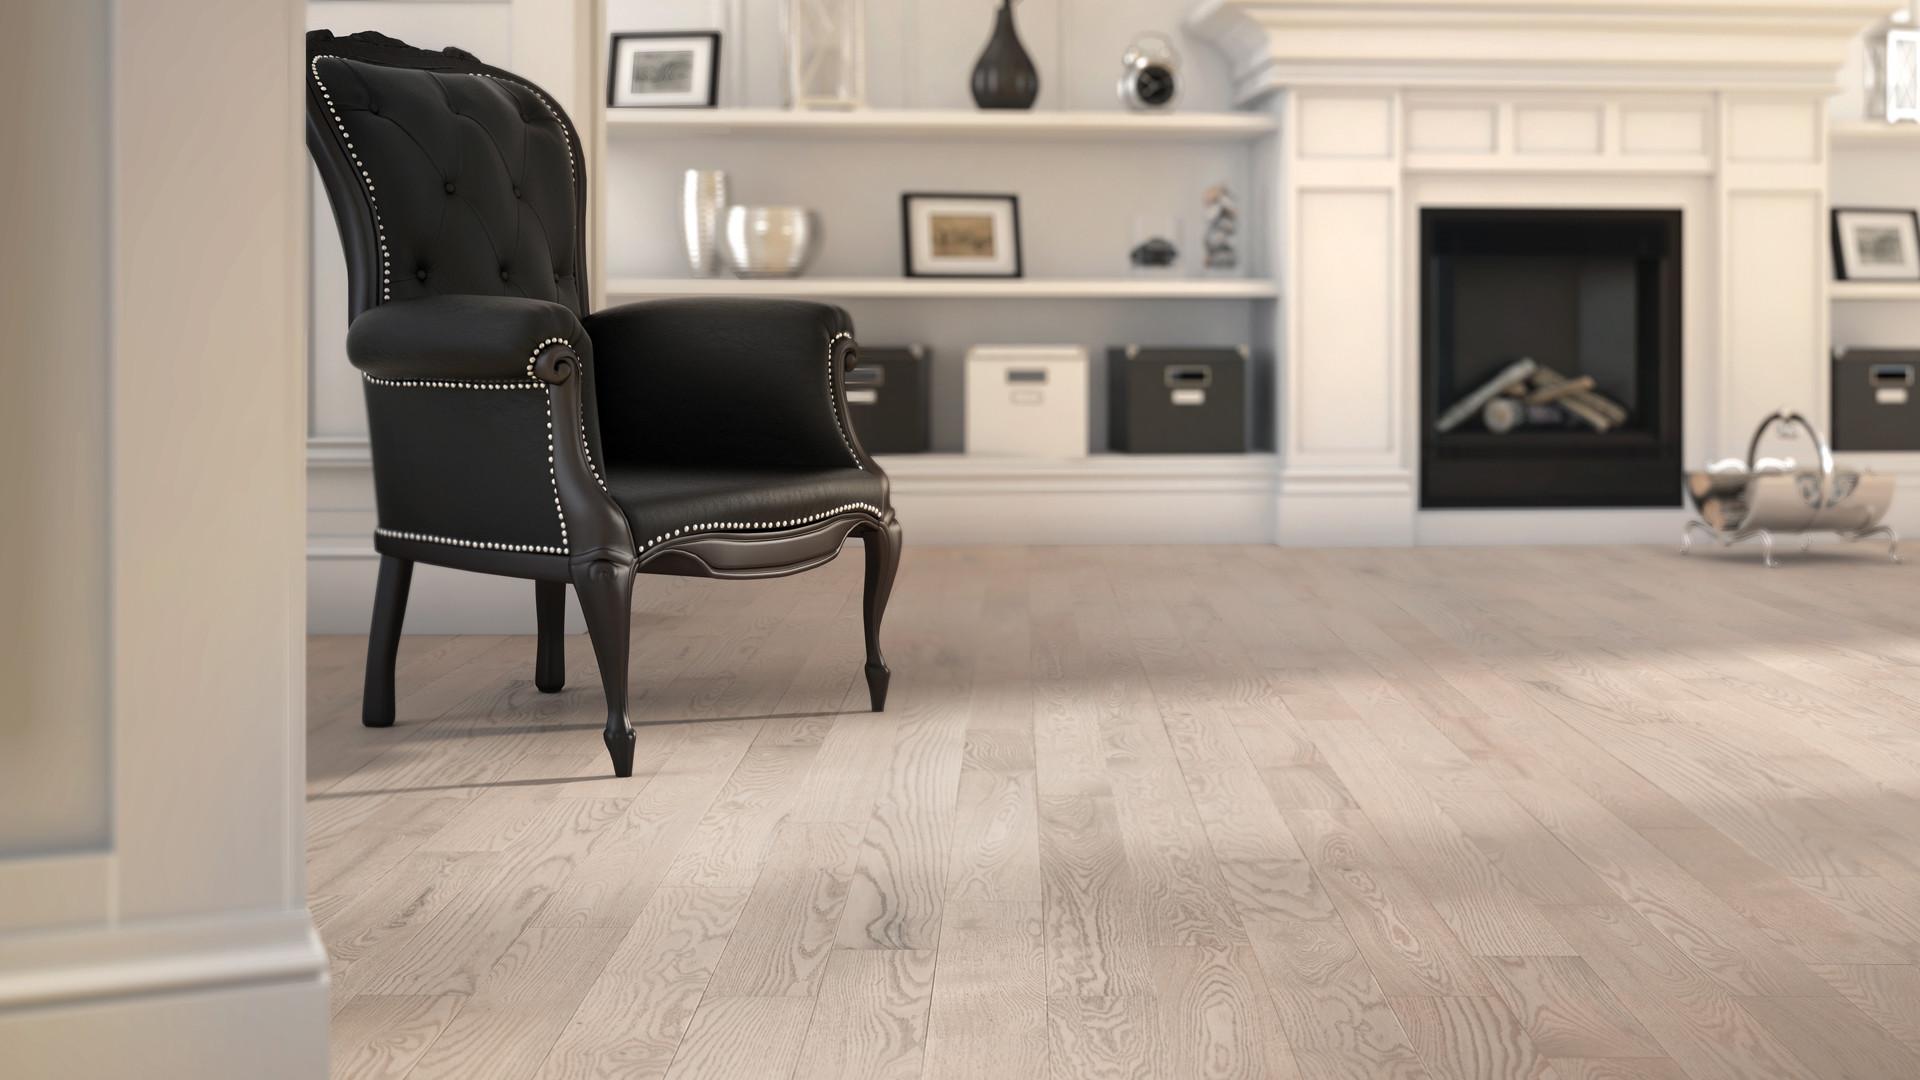 folex hardwood laminate and tile floor cleaner of does hardwood floor hardness matter lauzon flooring within 4 plank construction